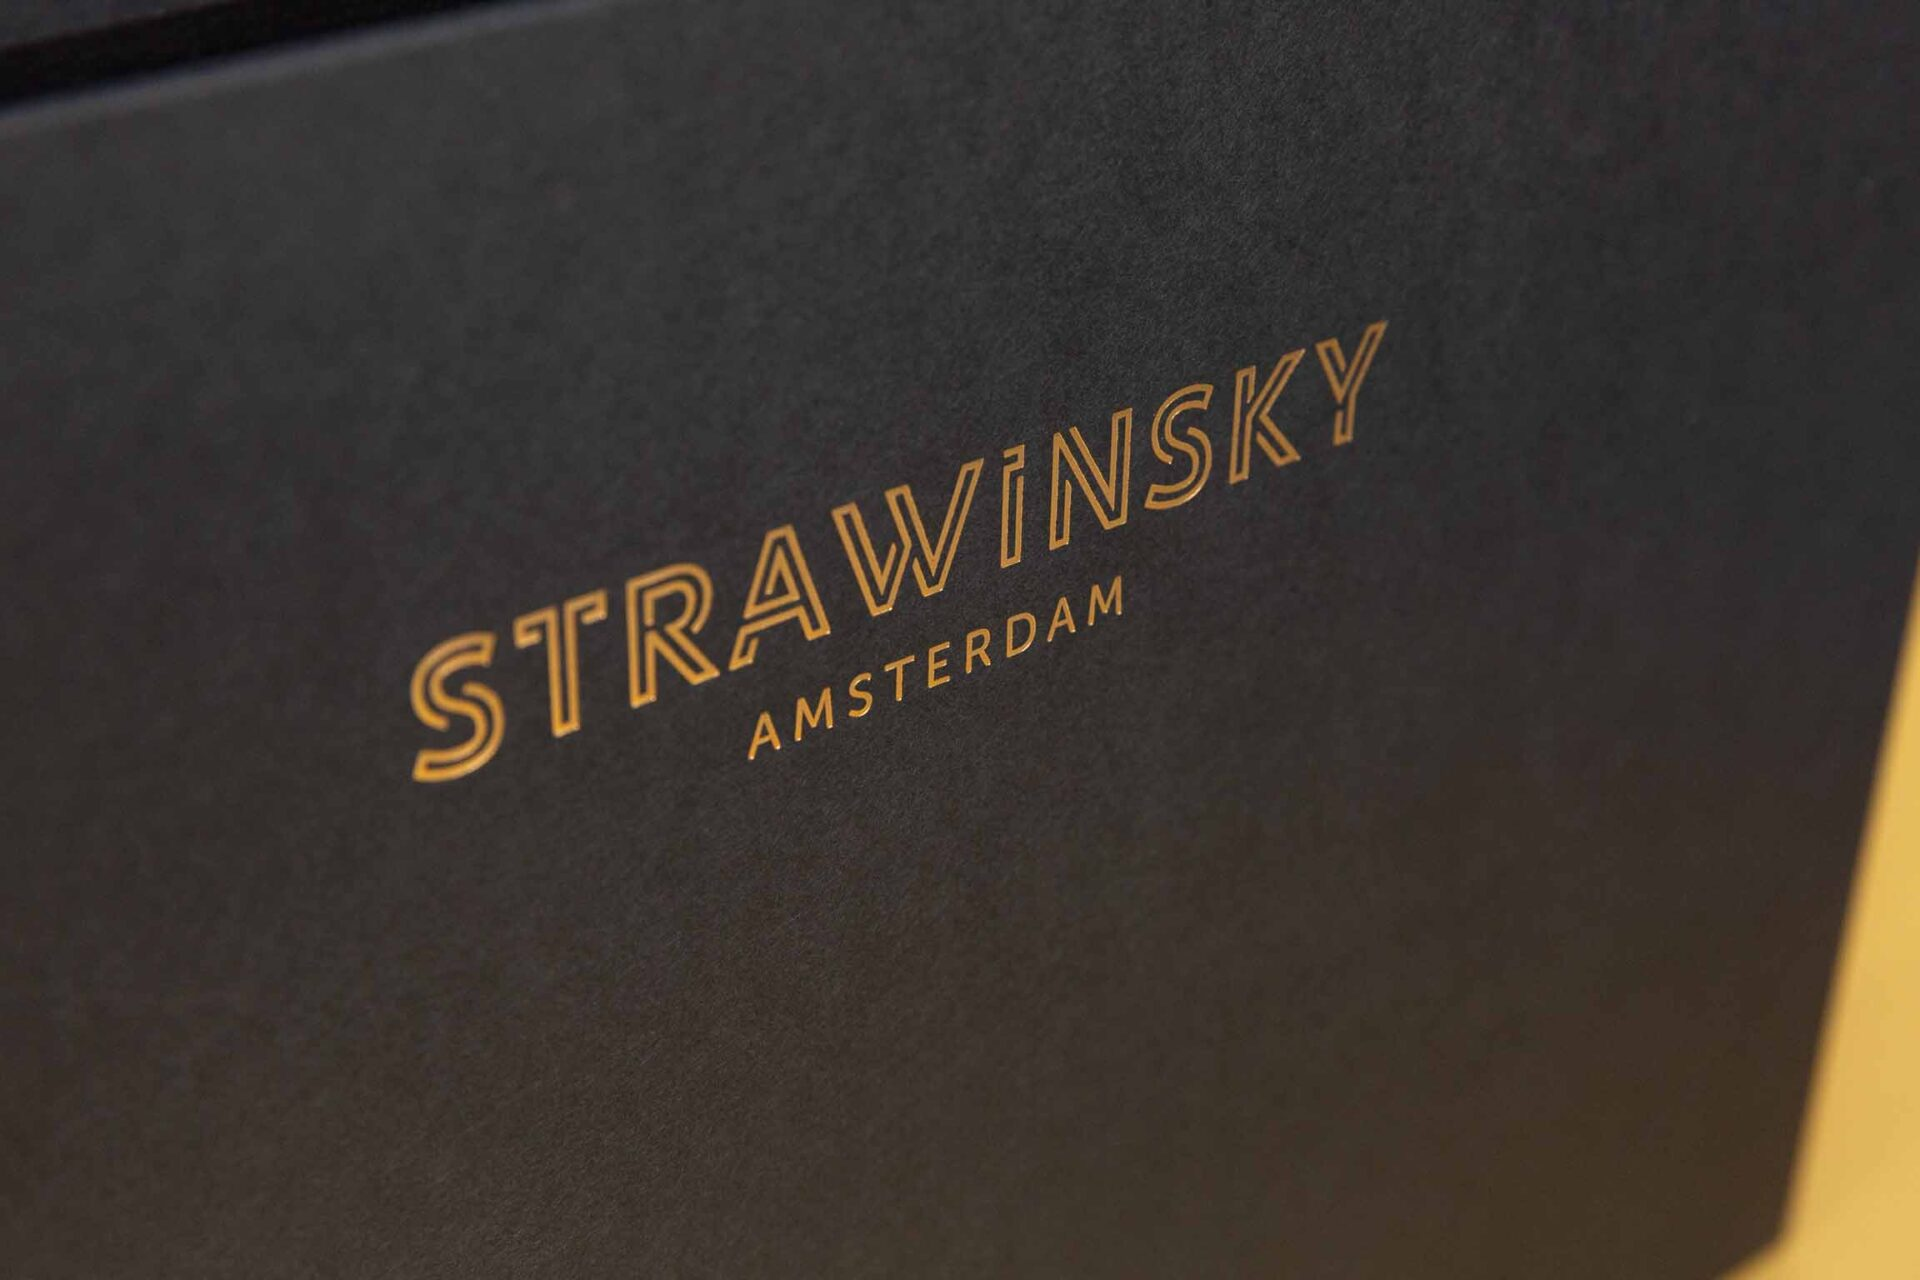 Liggend A4 ringband Strawinsky